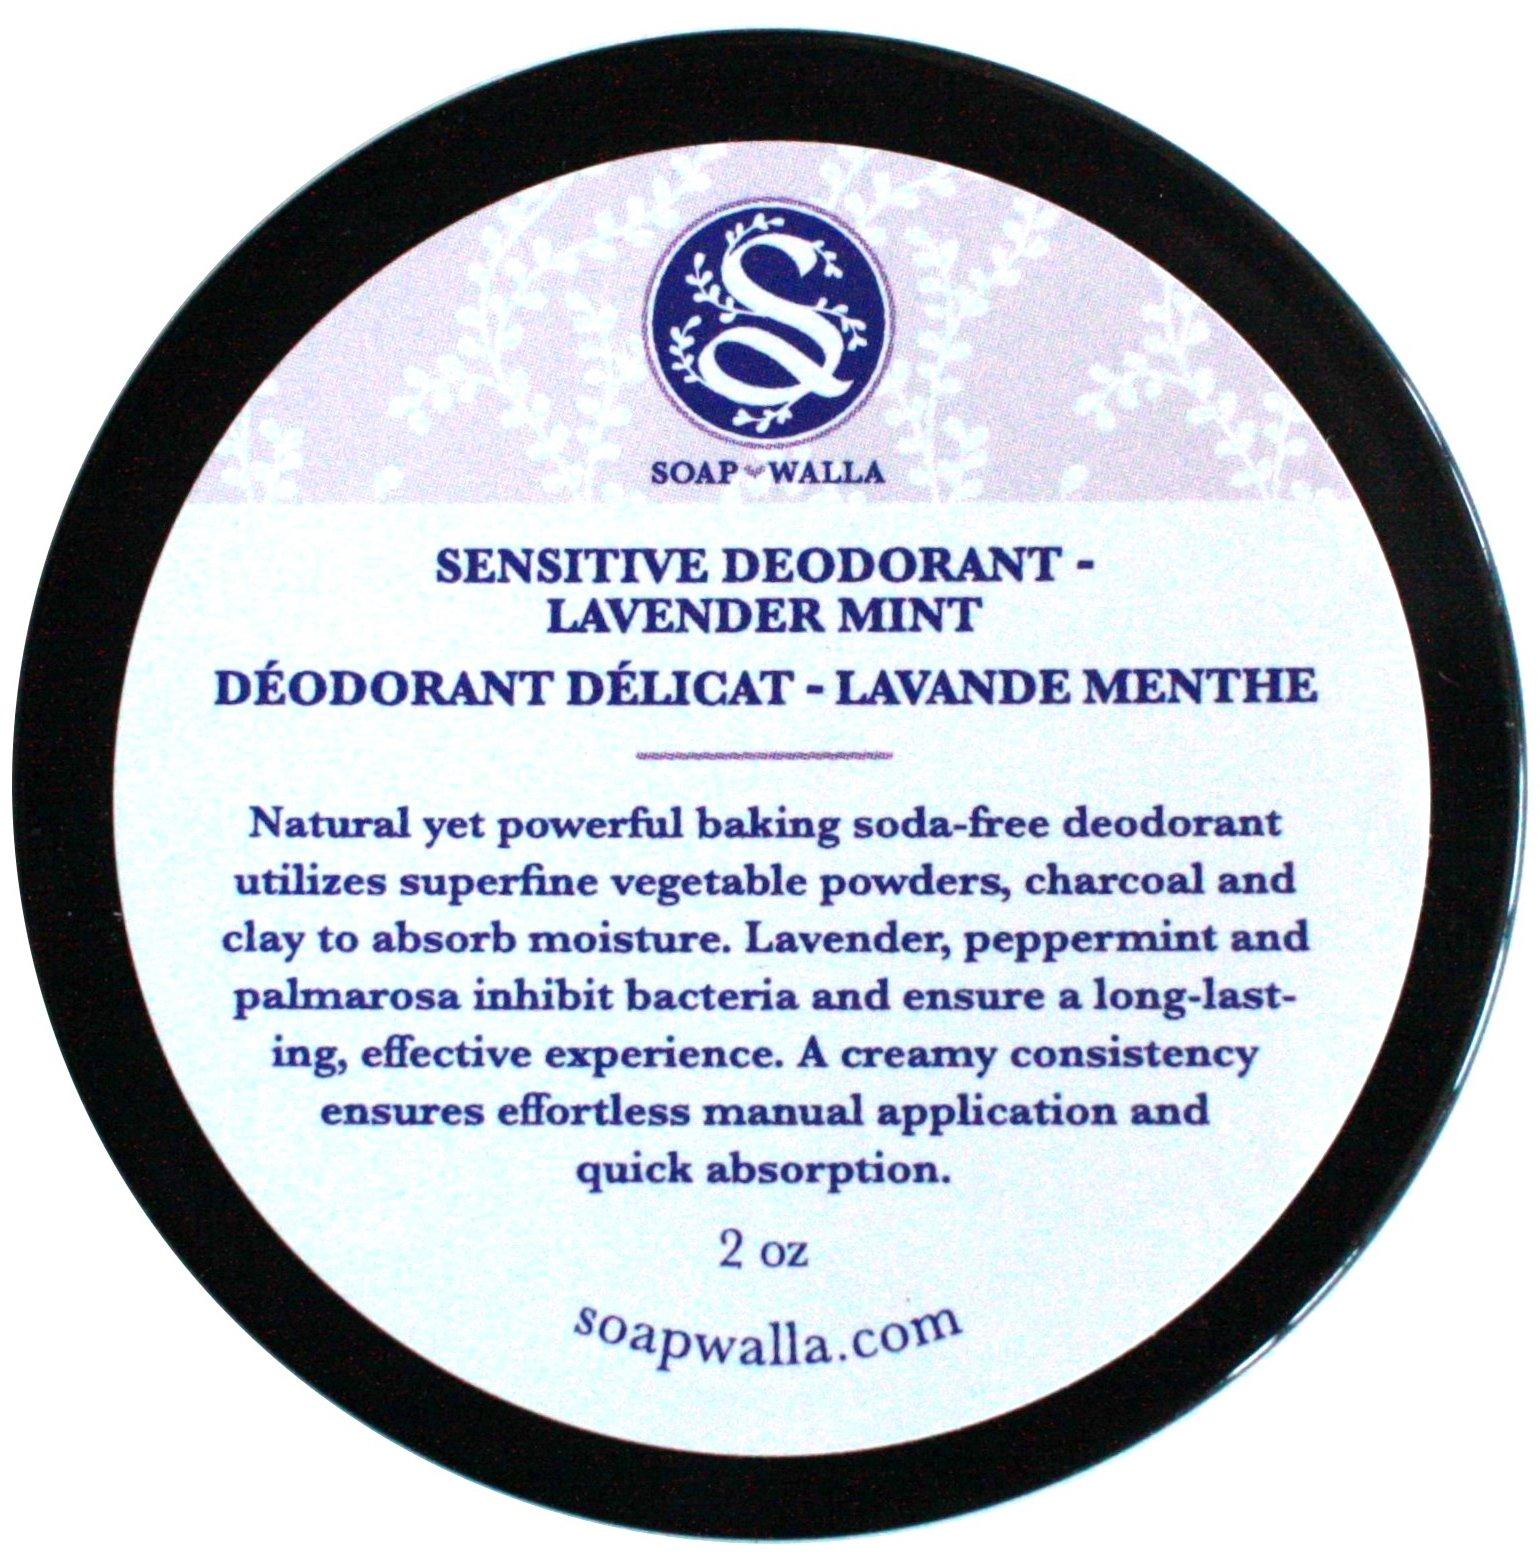 Soapwalla - Organic/Vegan Sensitive Skin Deodorant Cream (Lavender Mint, Baking Soda Free)